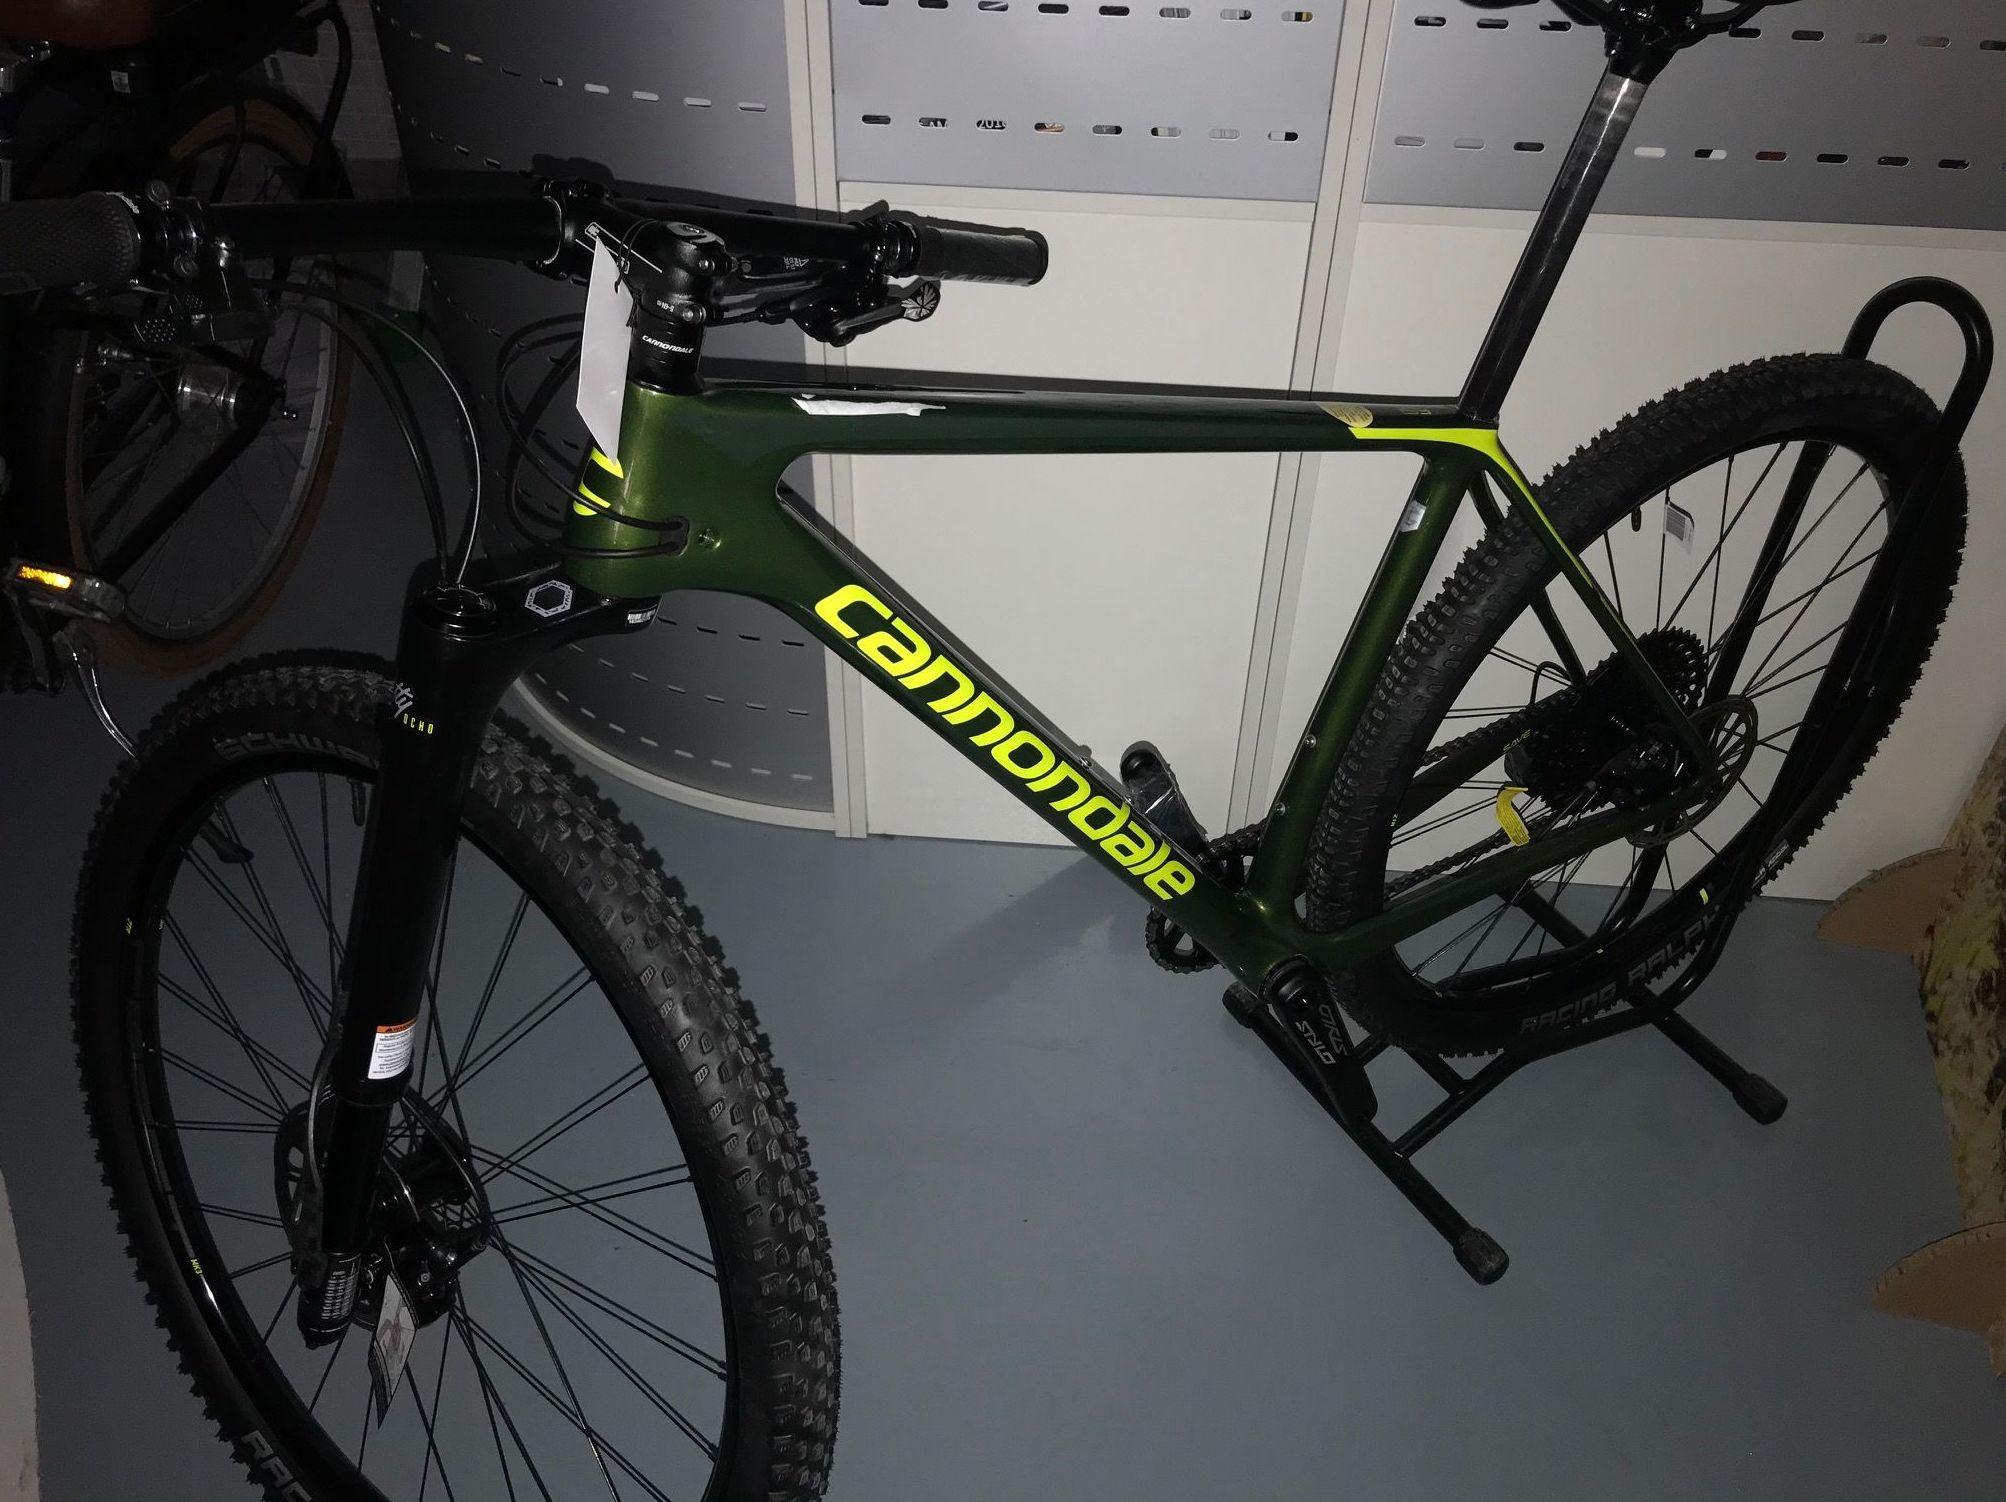 Bicicleta 2019 segunda mano.